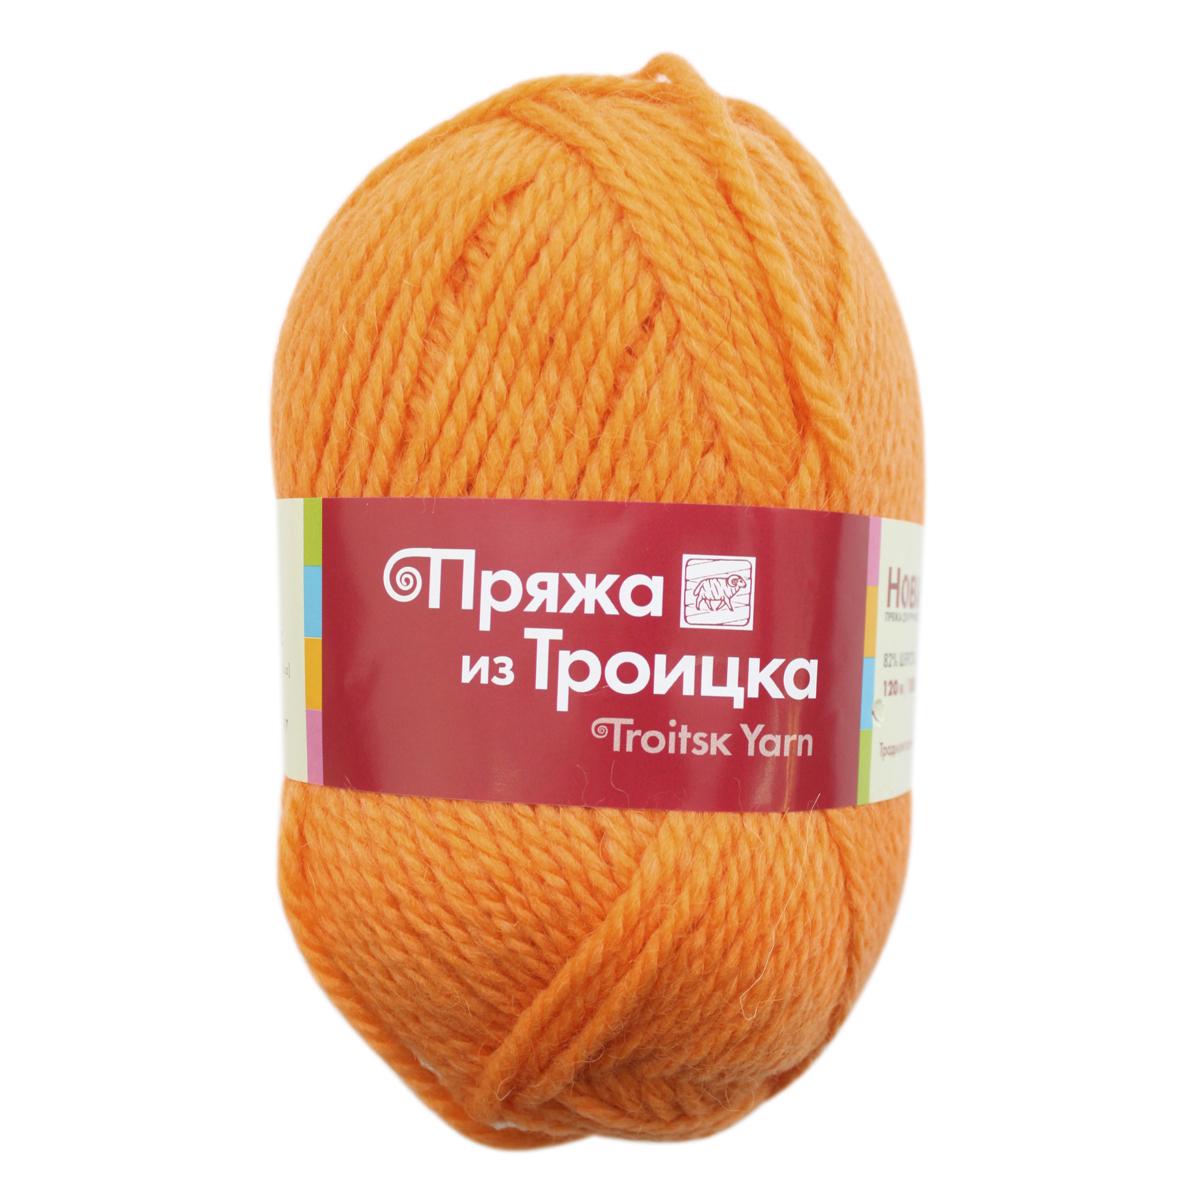 Пряжа для вязания Новинка, 100 г, 120 м, цвет: 0497 ярко-оранжевый, 10 шт366013_0497